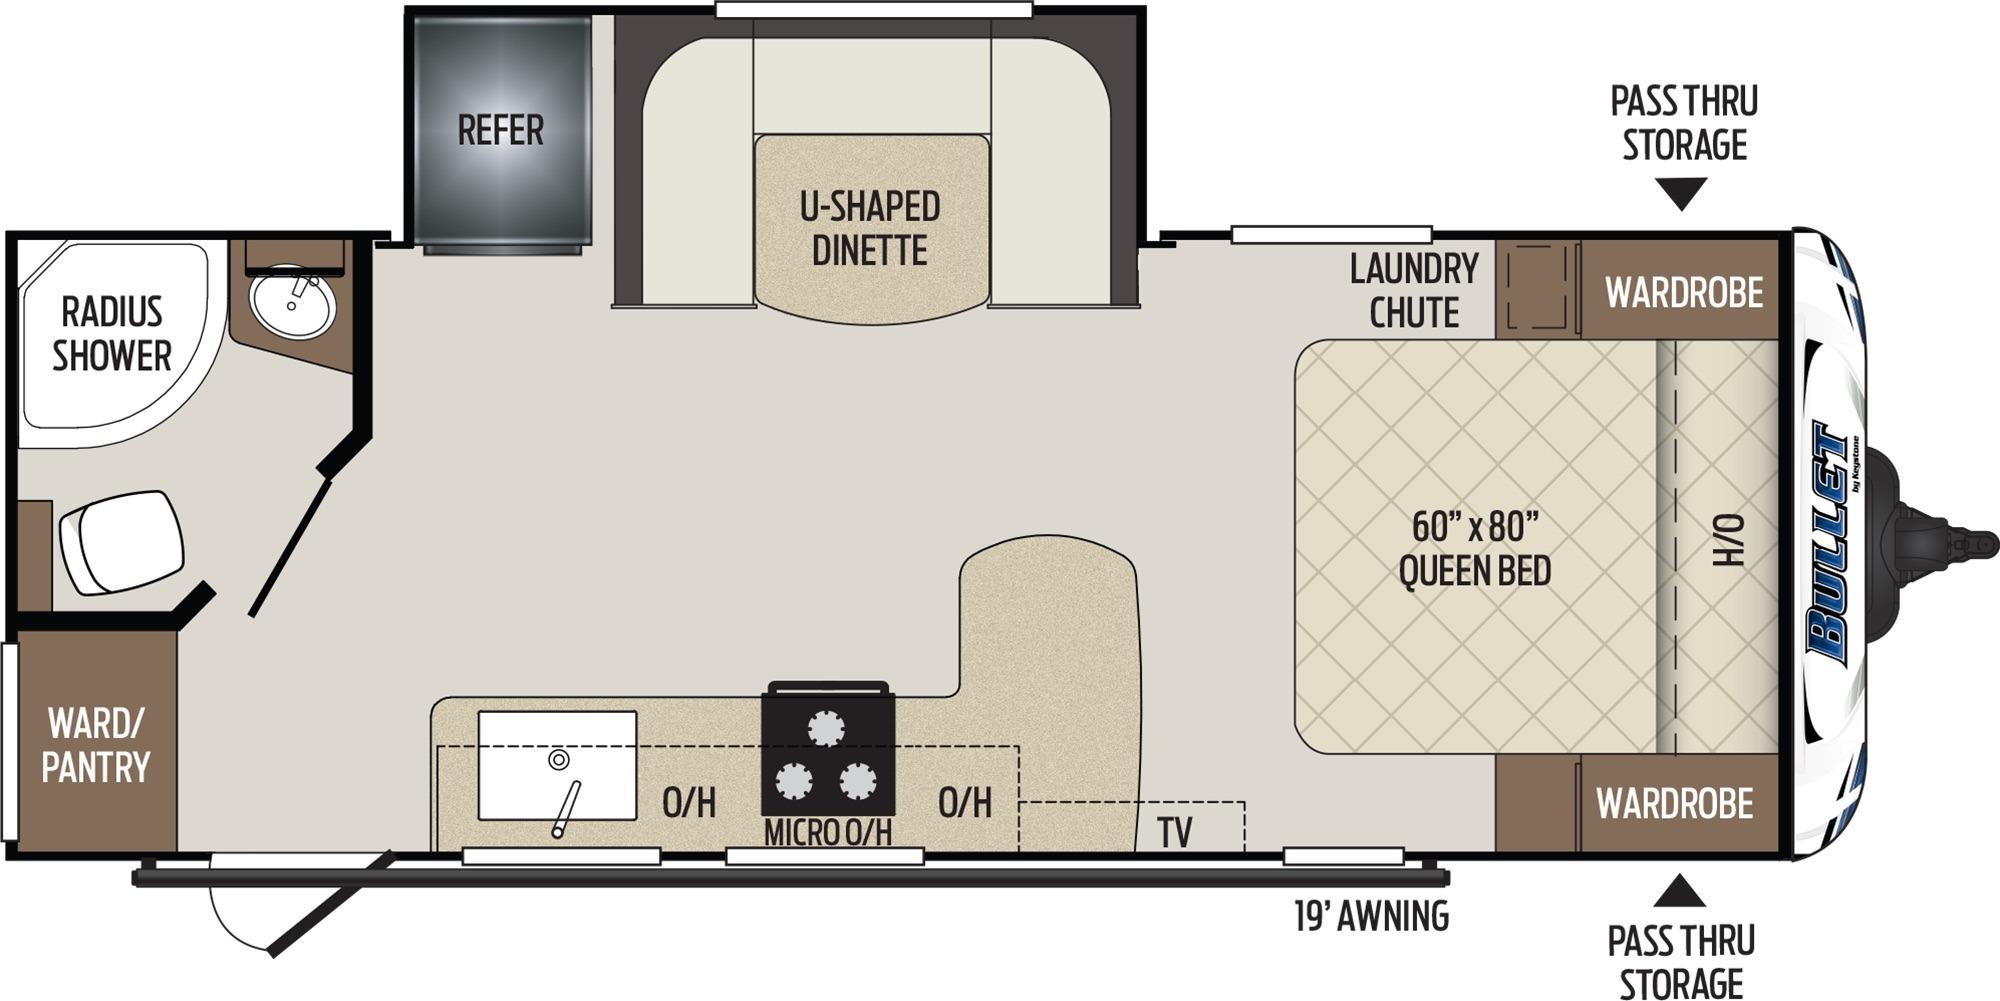 View Floor Plan for 2019 KEYSTONE BULLET 221RBS